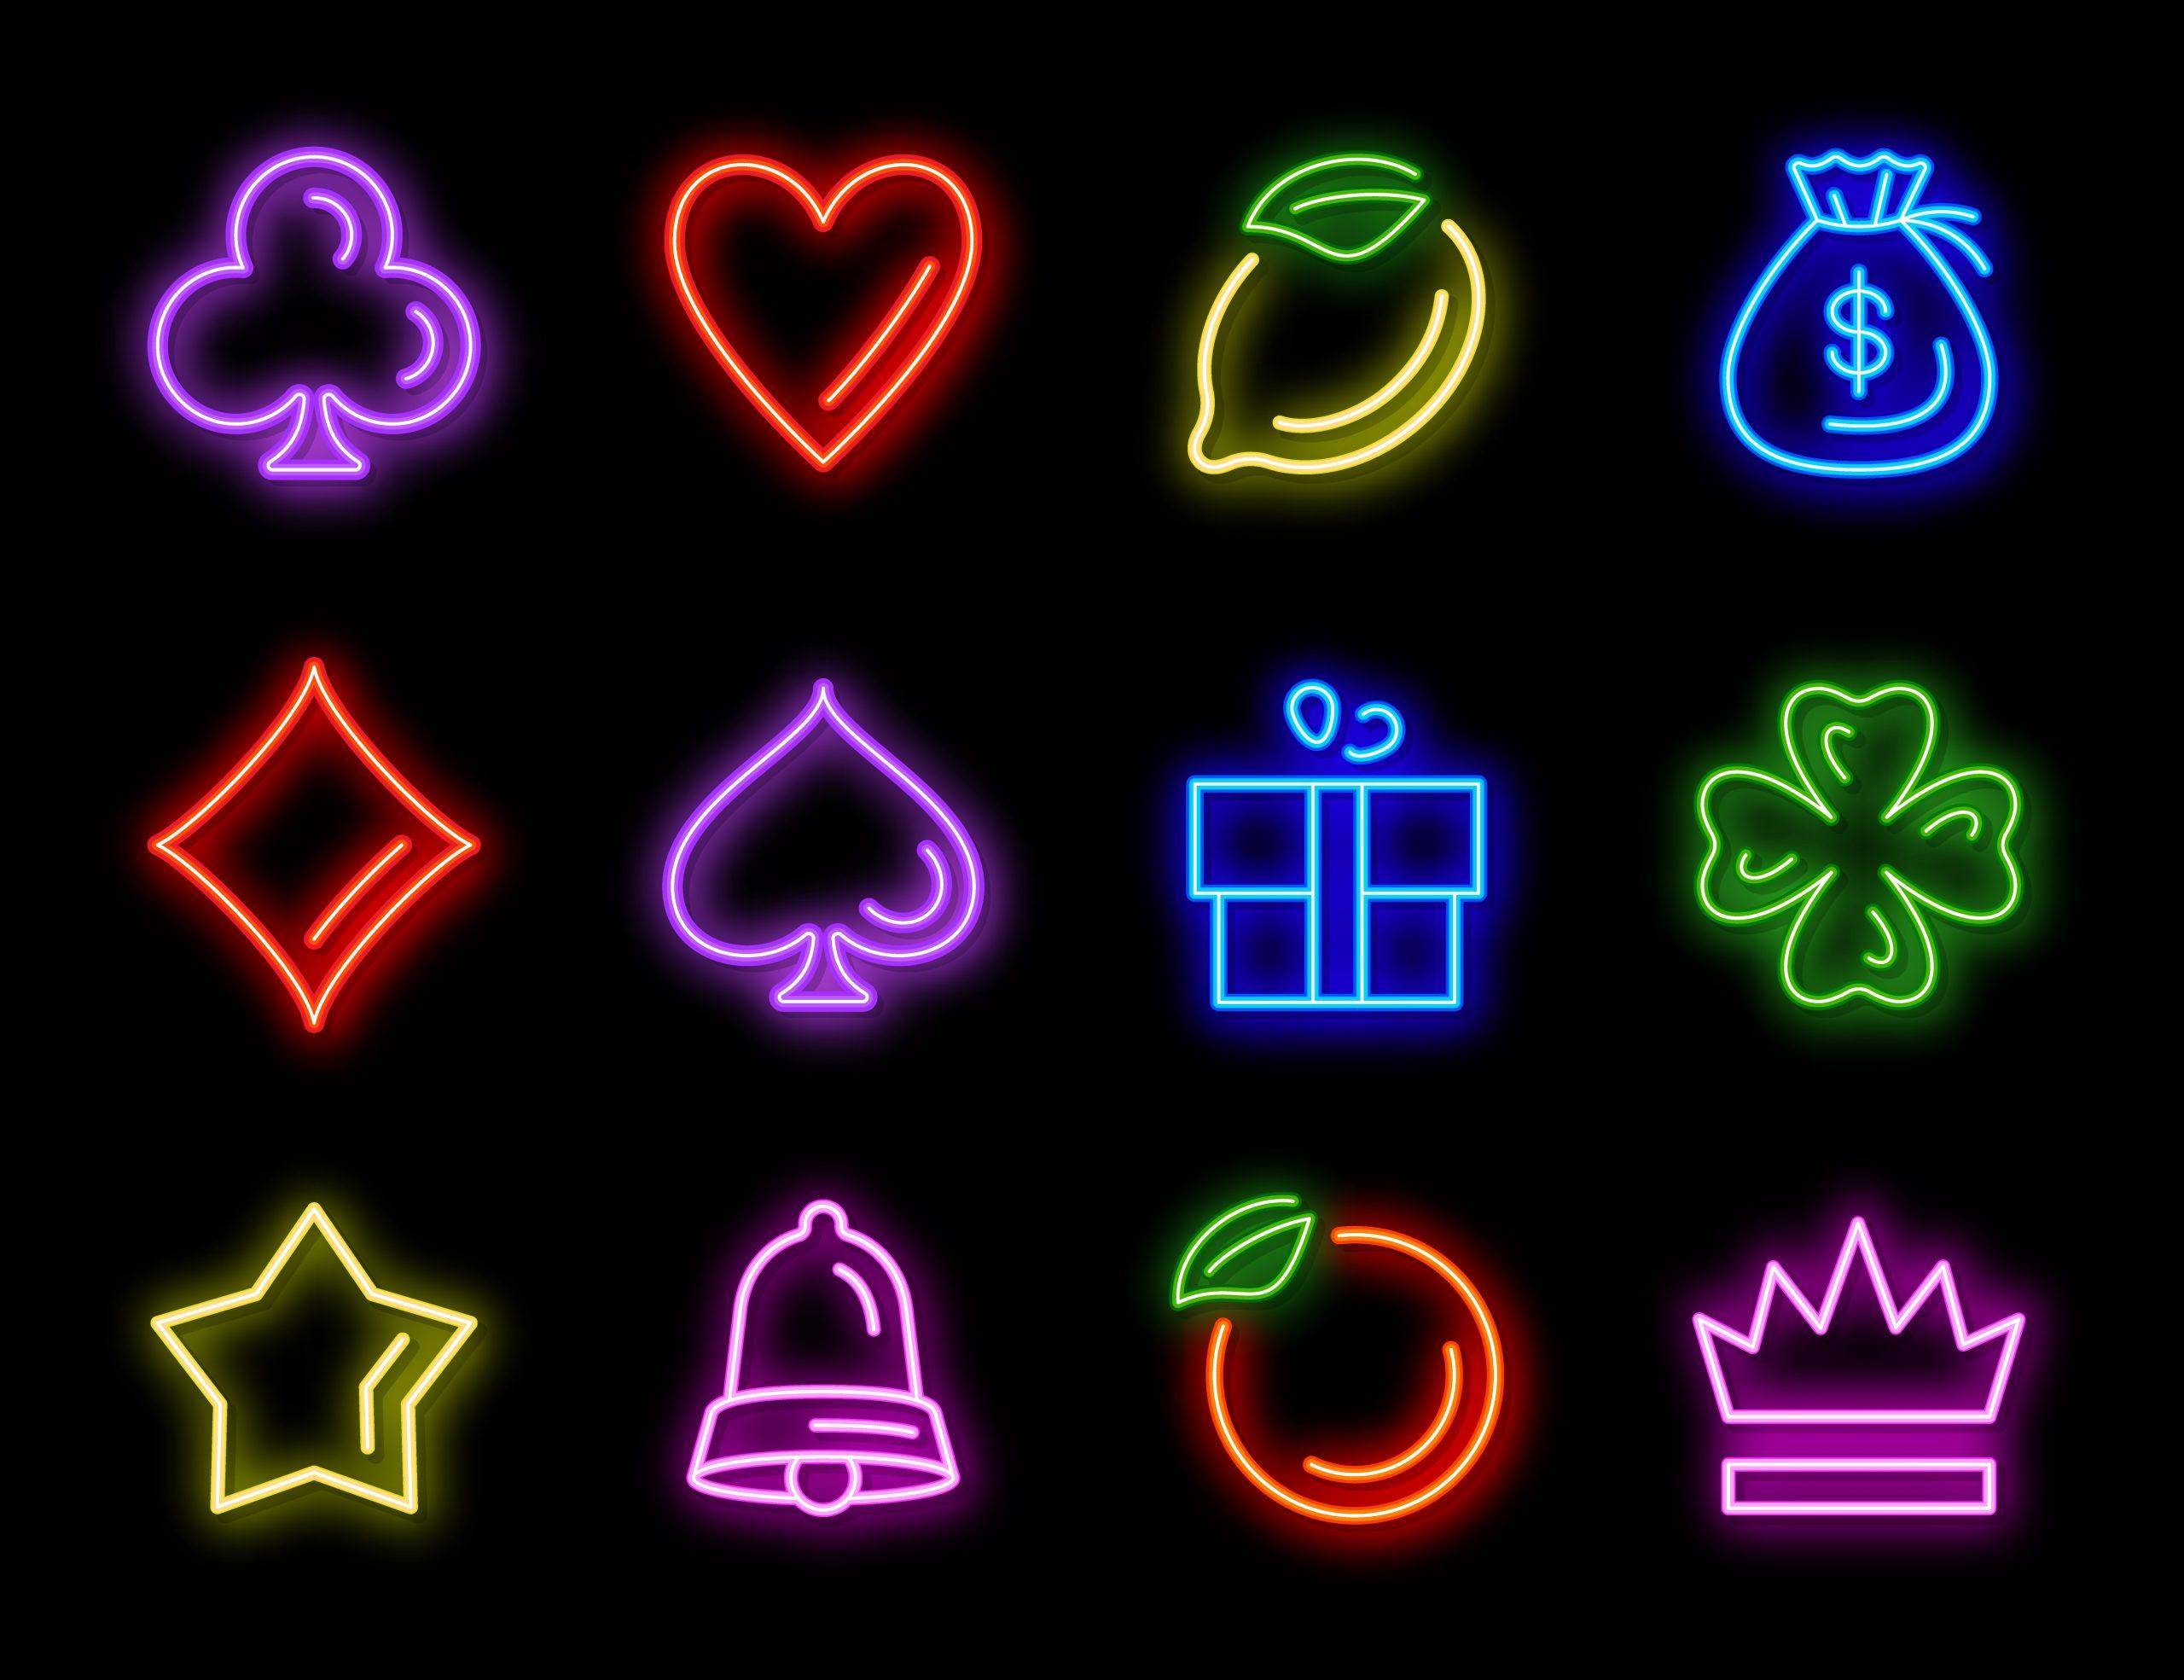 Slot machine neon icons